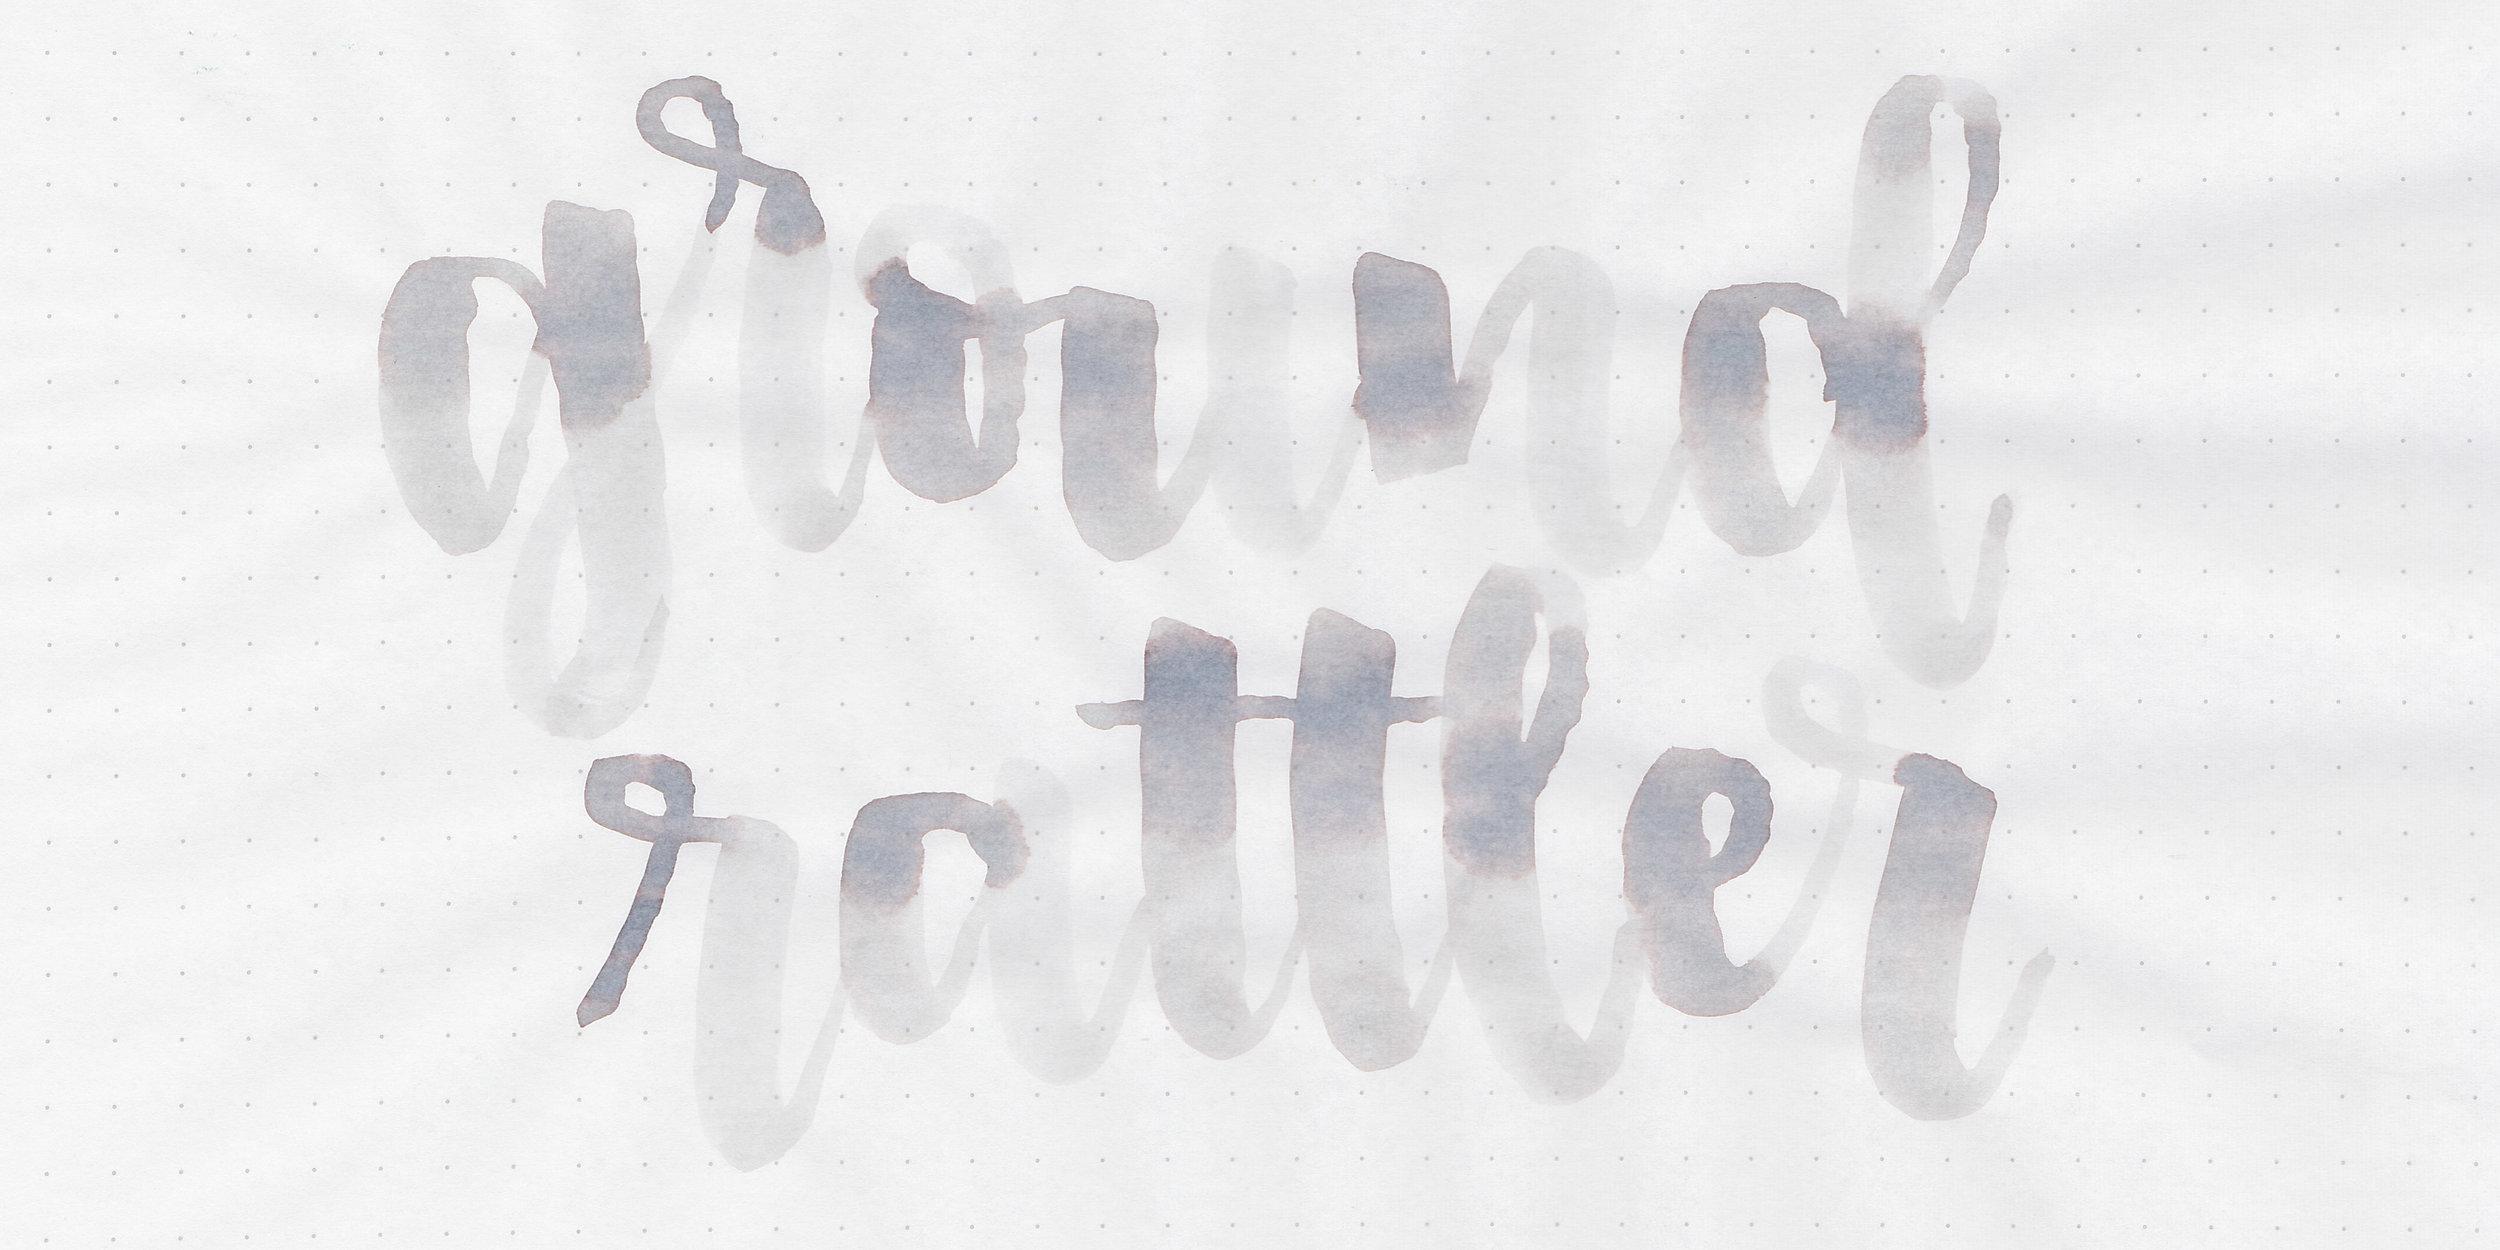 bkb-ground-rattler-2.jpg